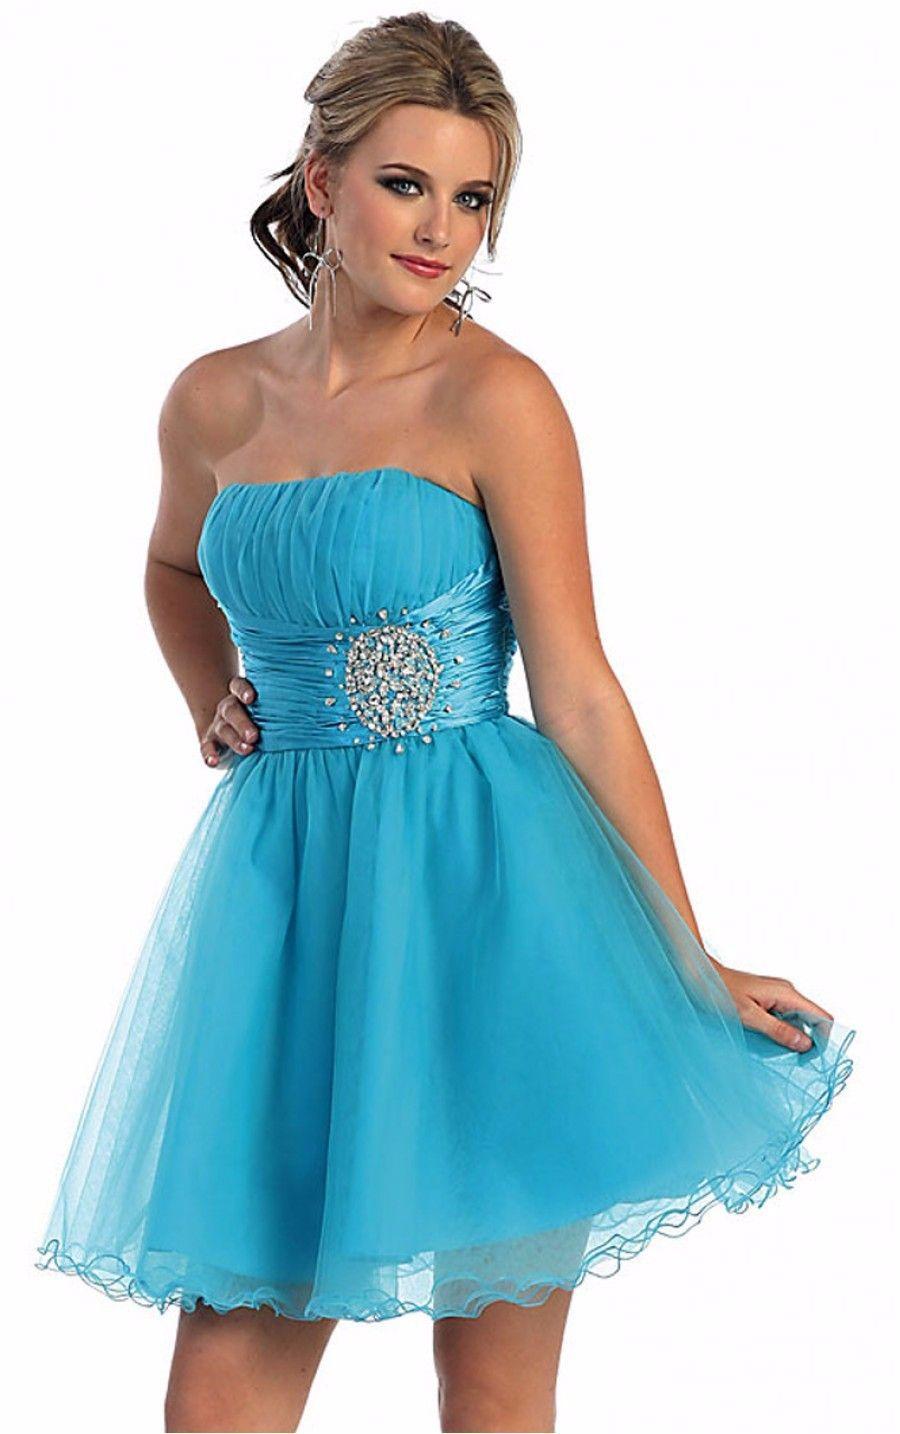 Malibu Blue Short Party Dress Short Bridesmaid Dress Prom Dress with Beading